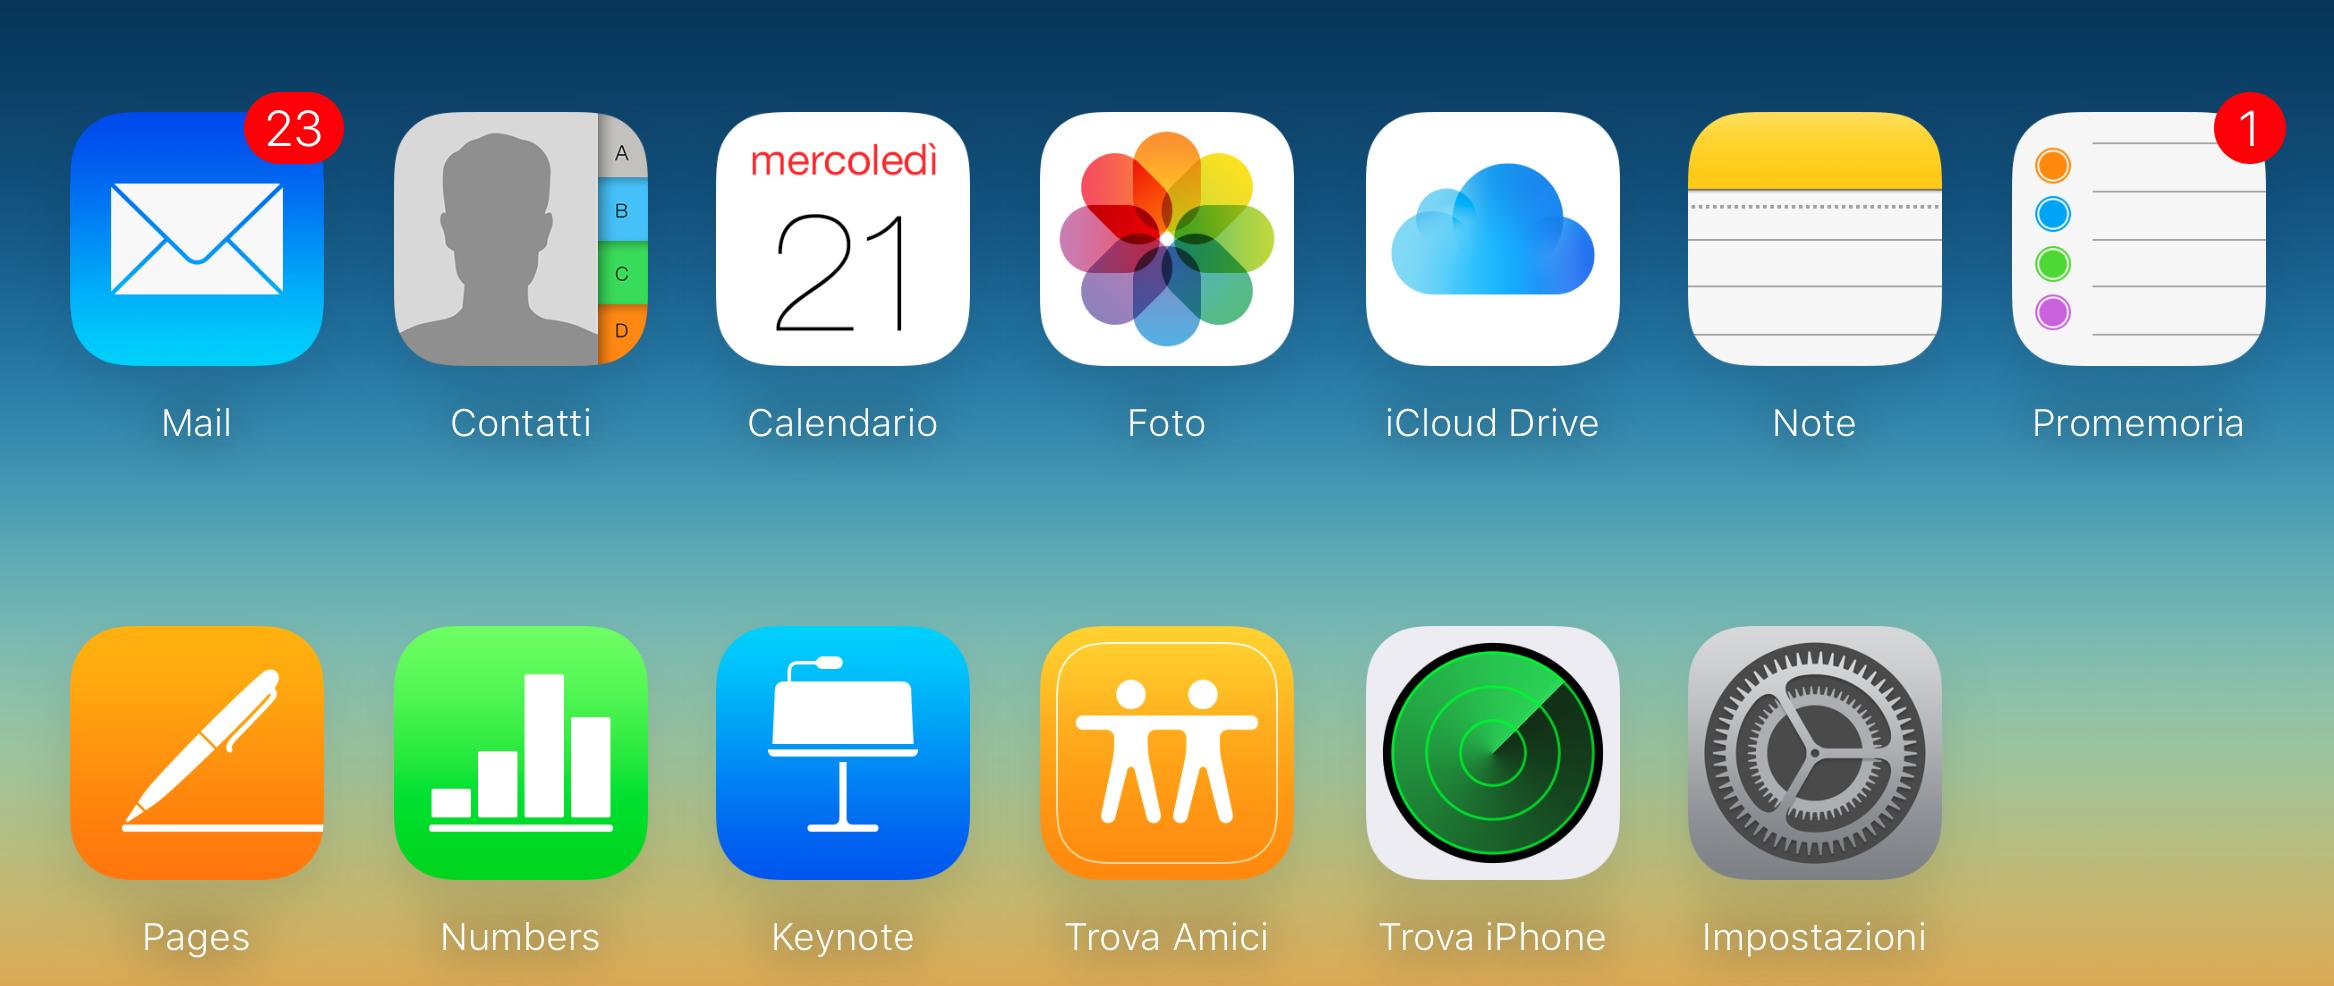 Screenshot 2015-10-21 23.25.46